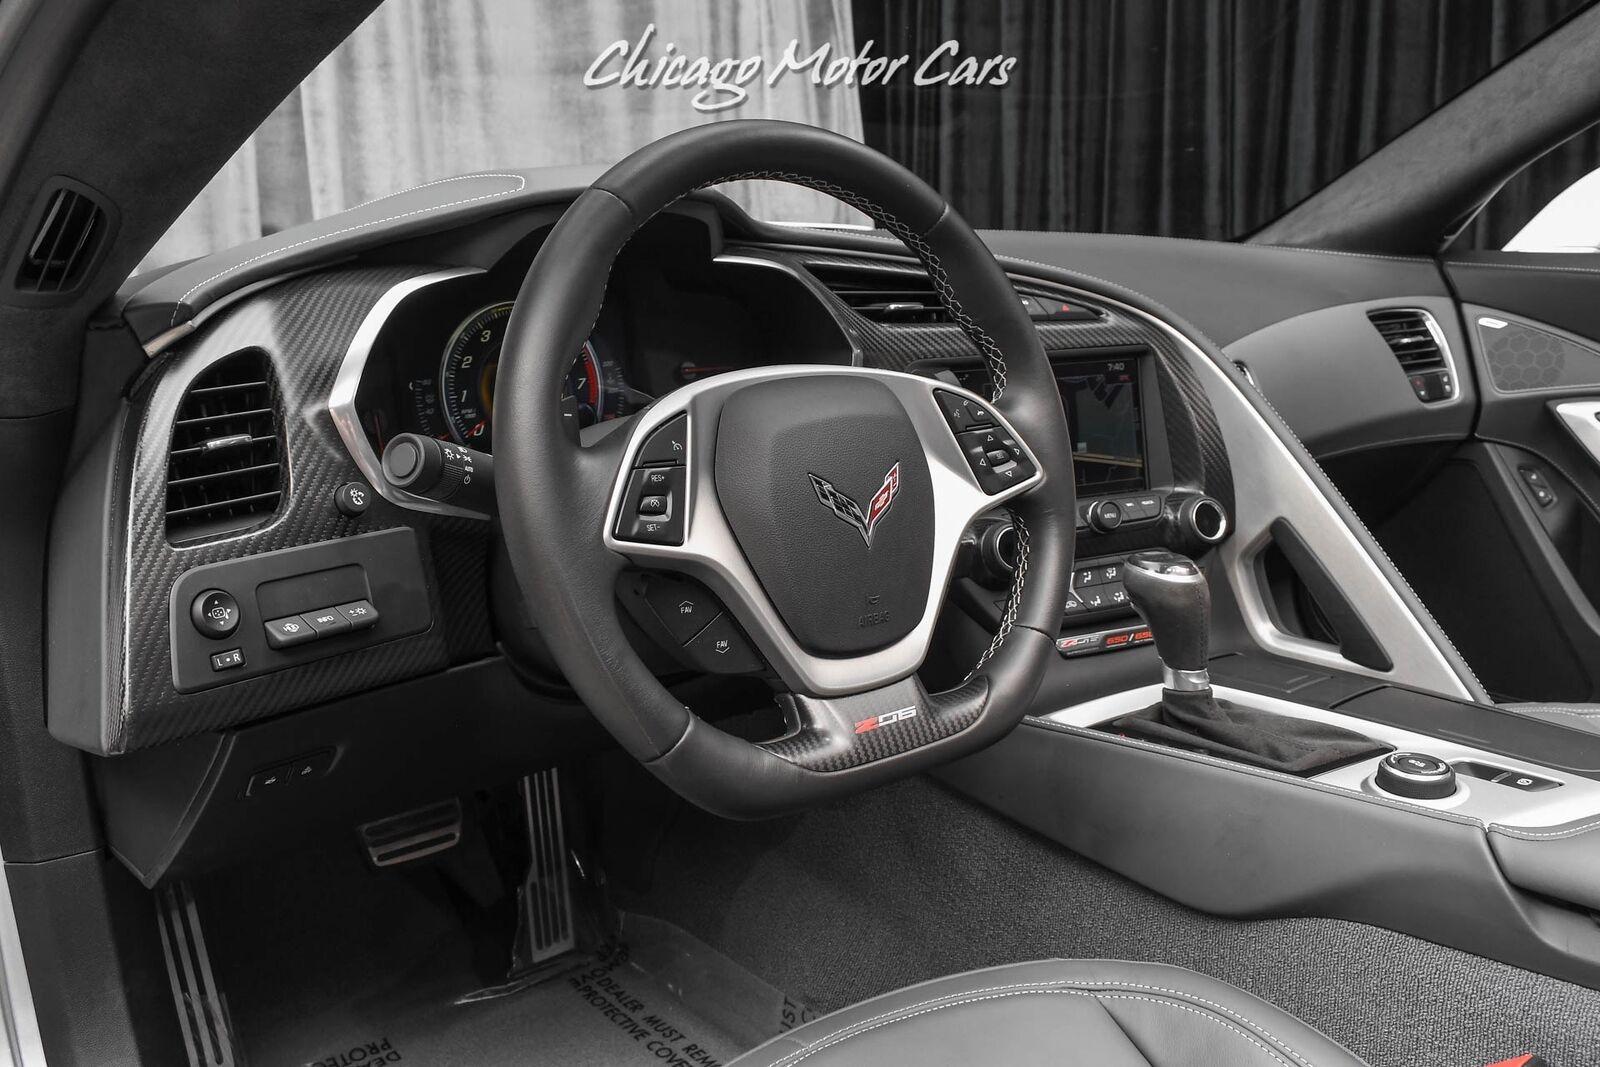 2016 Silver Chevrolet Corvette Z06 3LZ   C7 Corvette Photo 8